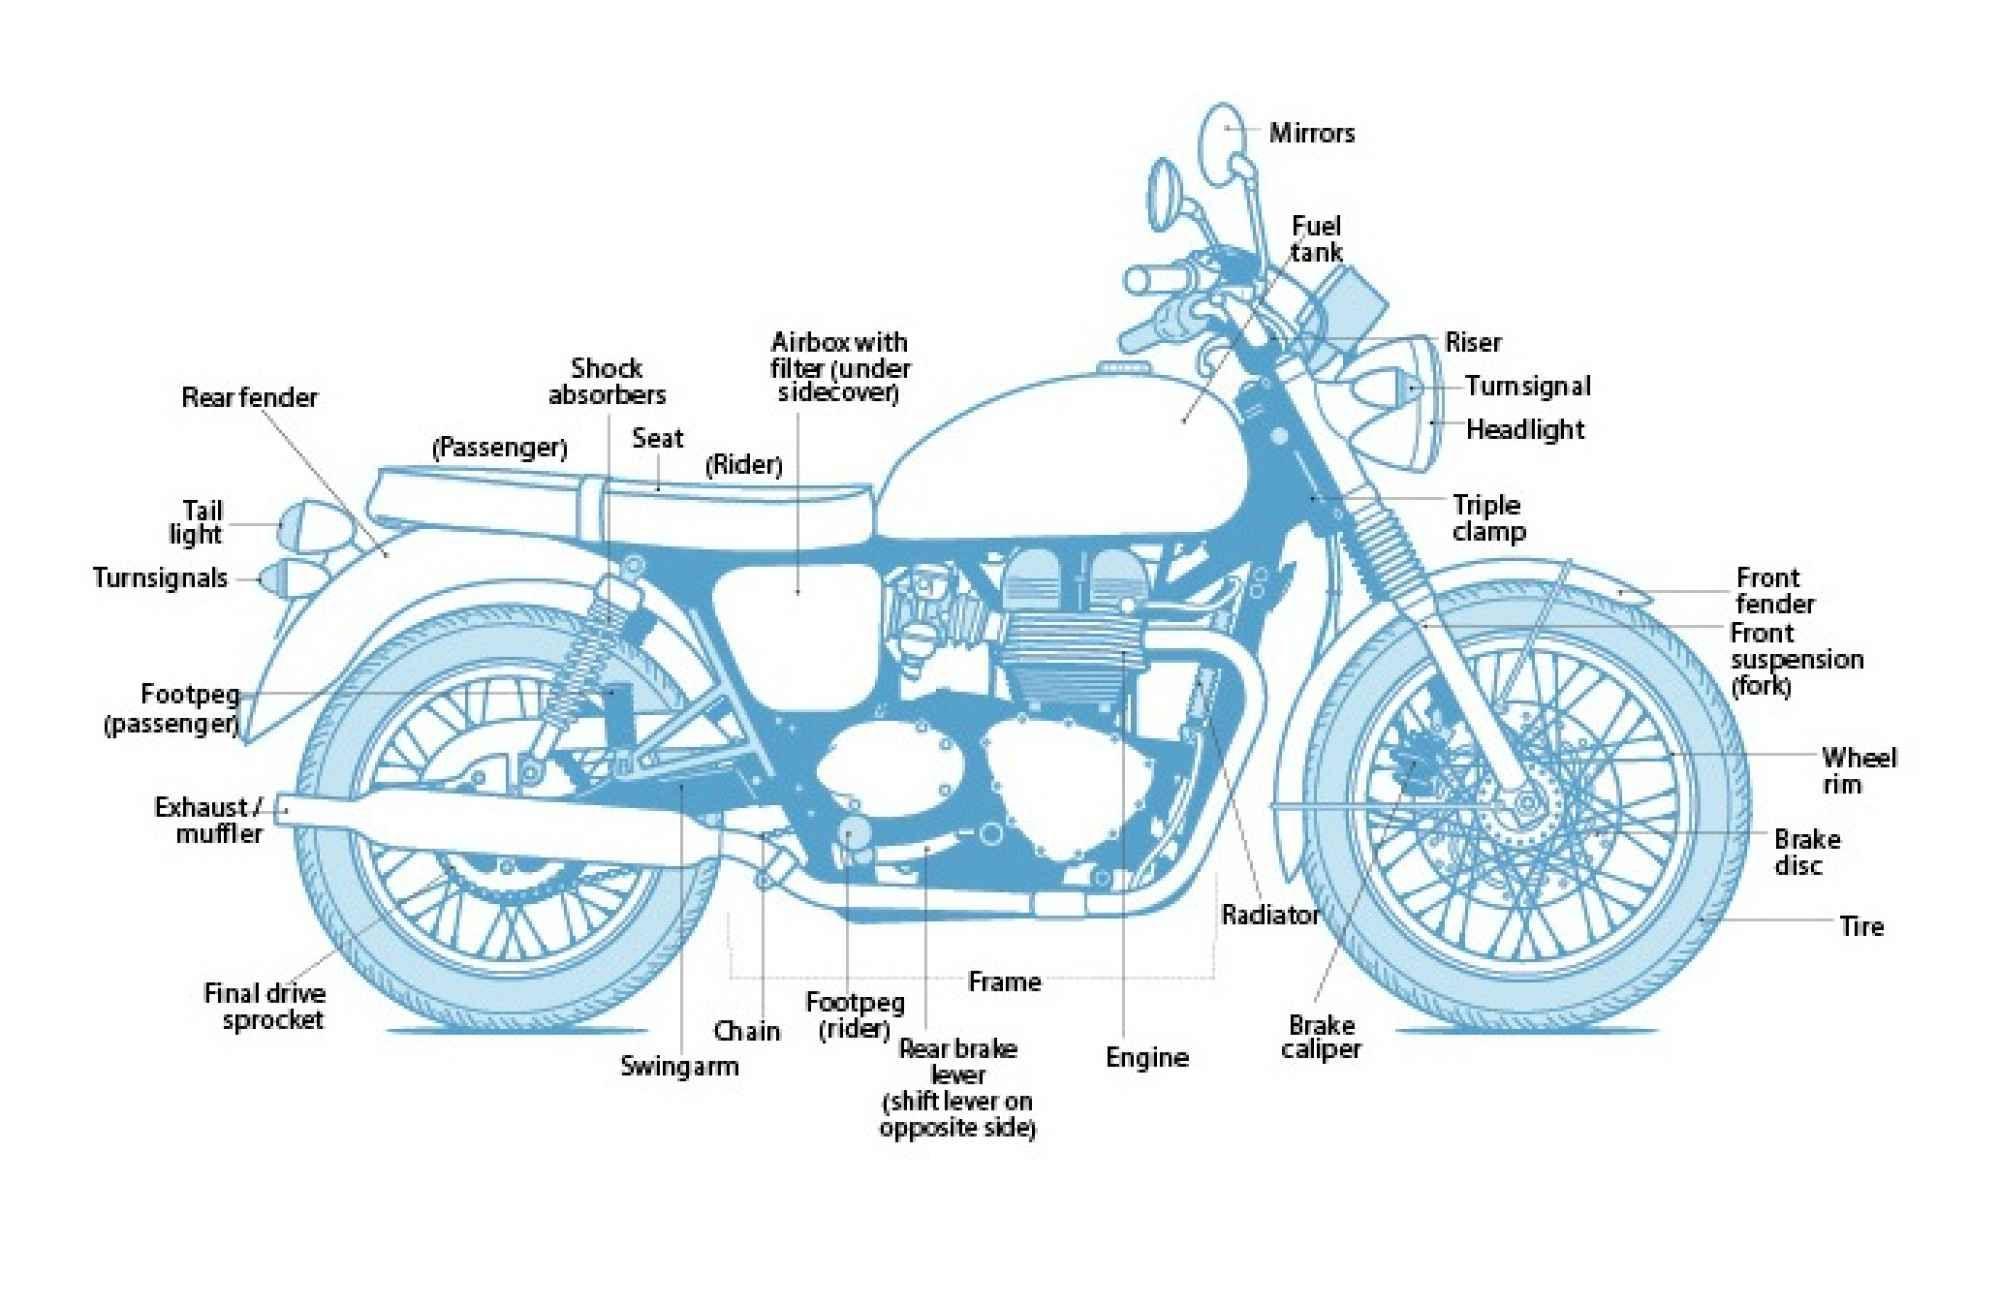 medium resolution of motorcycle diagram motorcycles motorcycle cafe racer bikes harley davidson motorcycle parts diagram